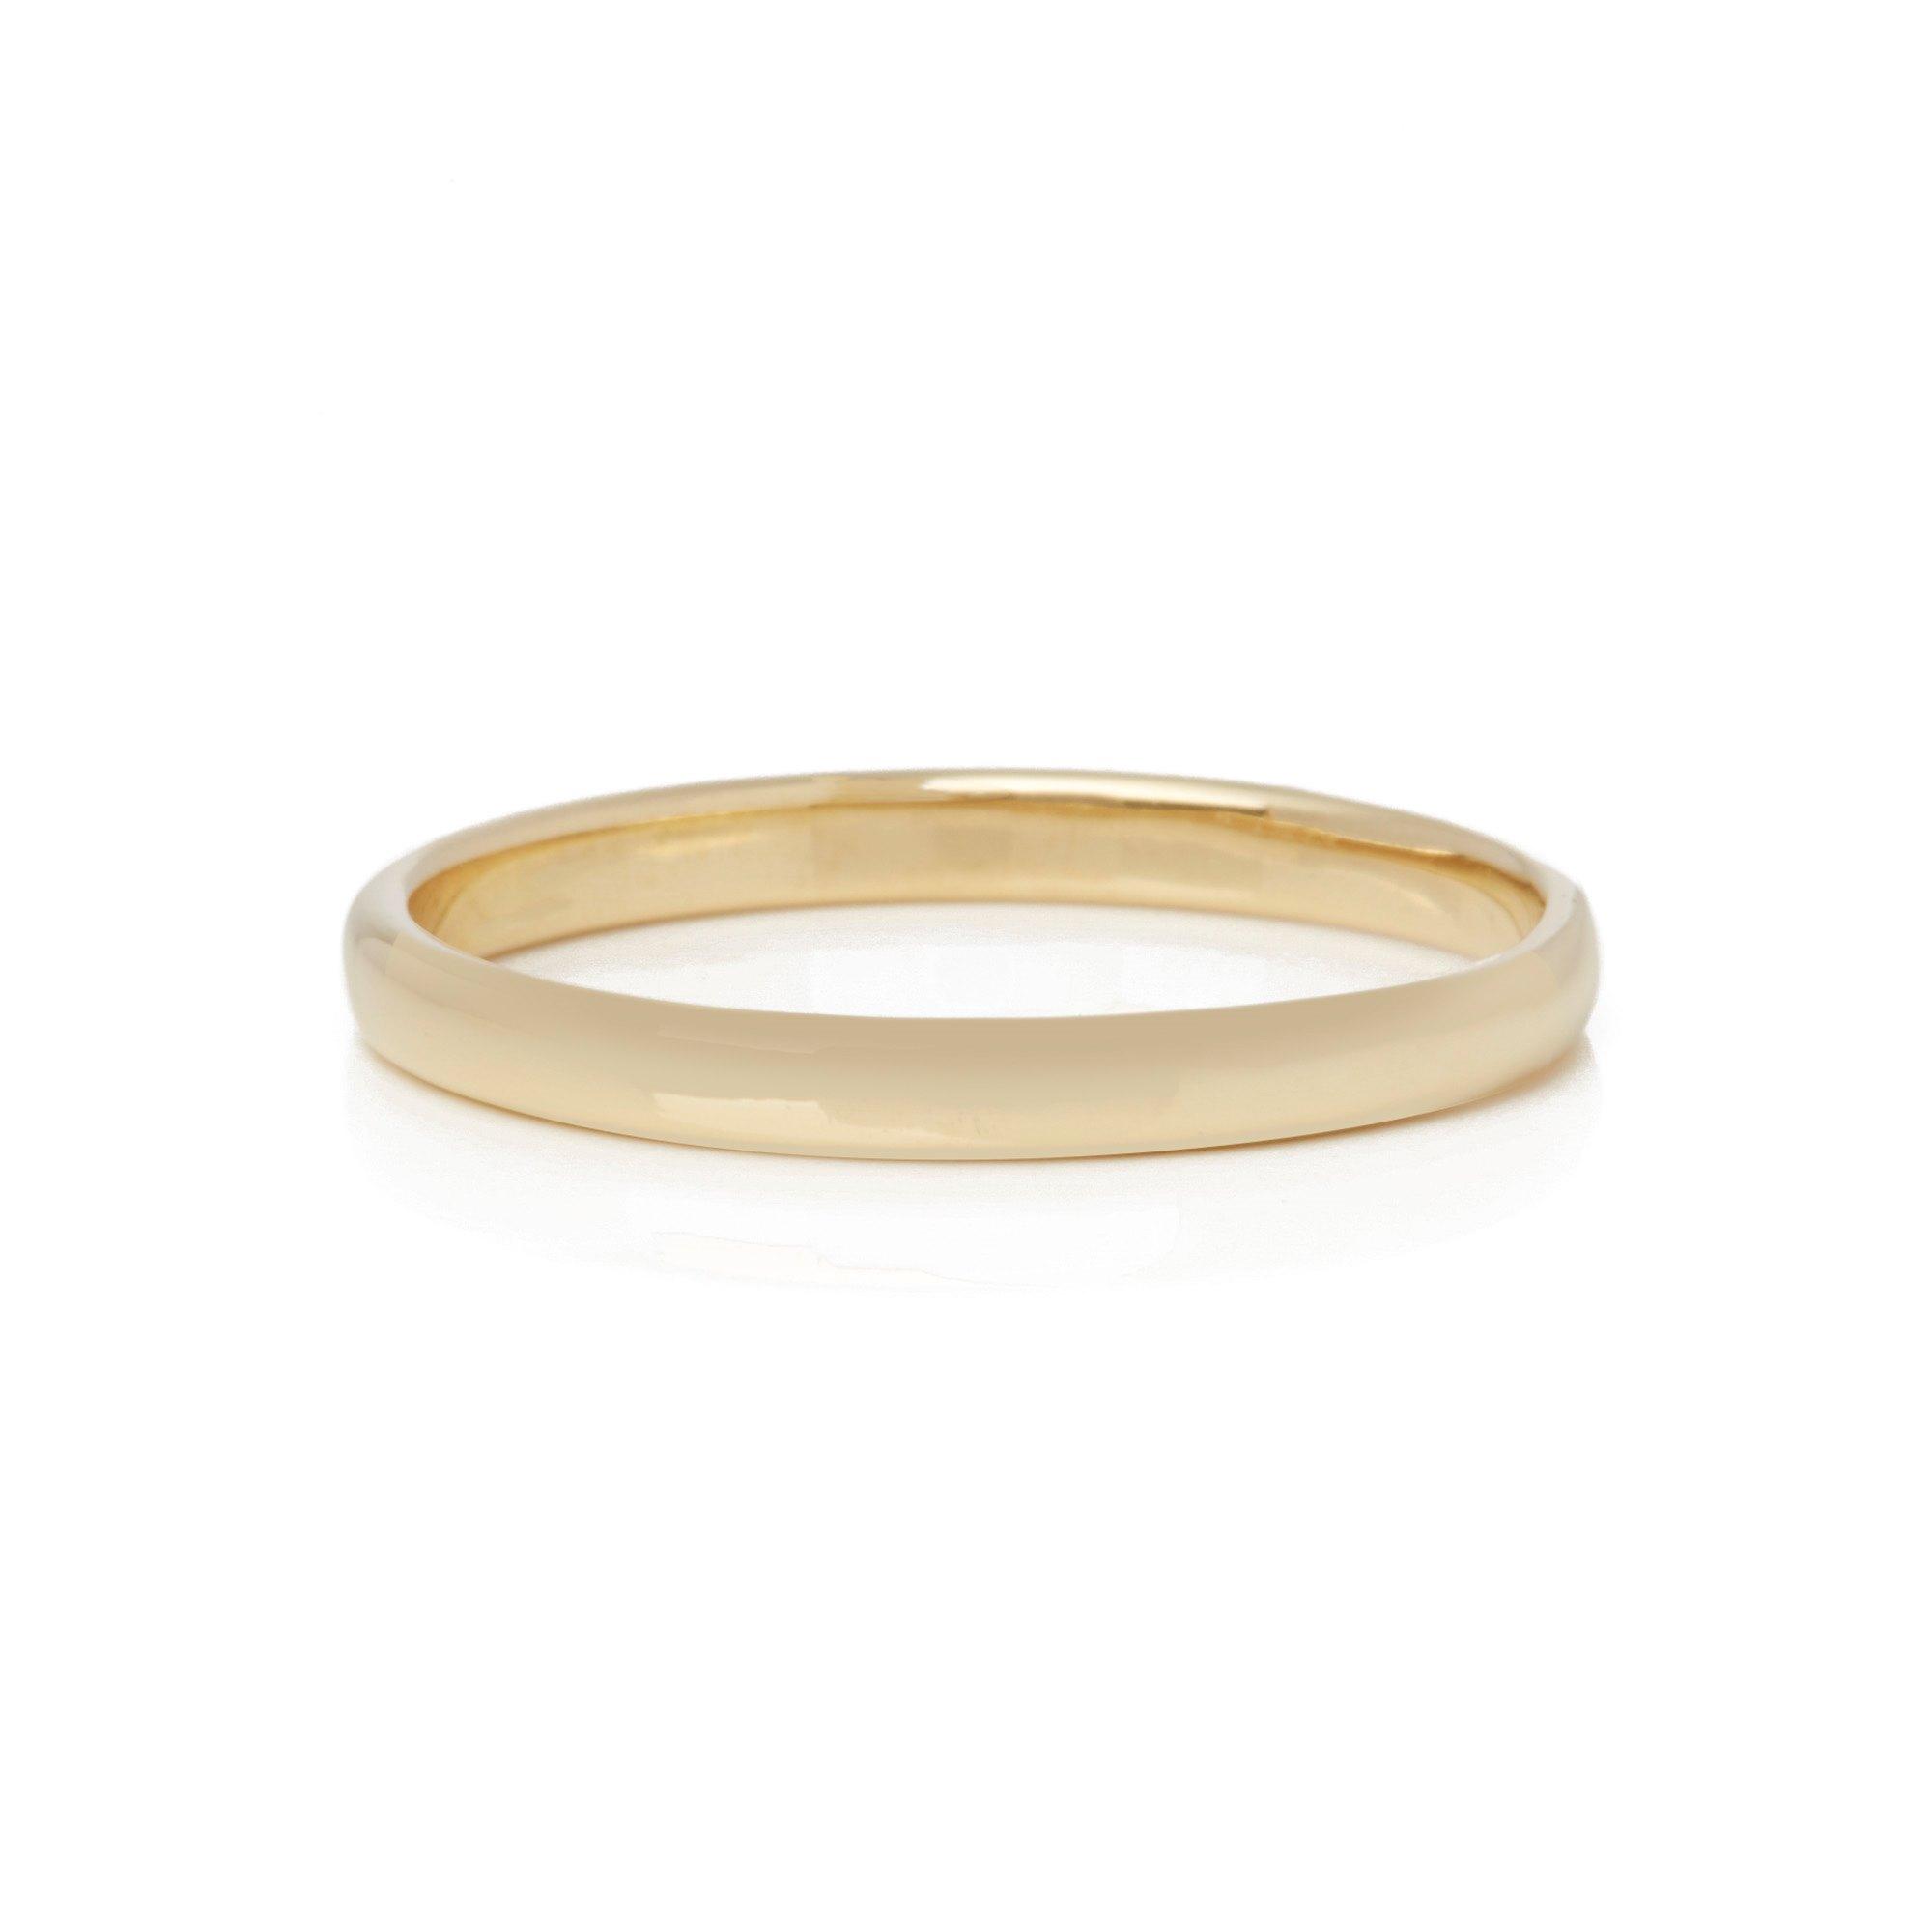 Tiffany & Co. 18k Yellow Gold 2.03mm Court Wedding Band